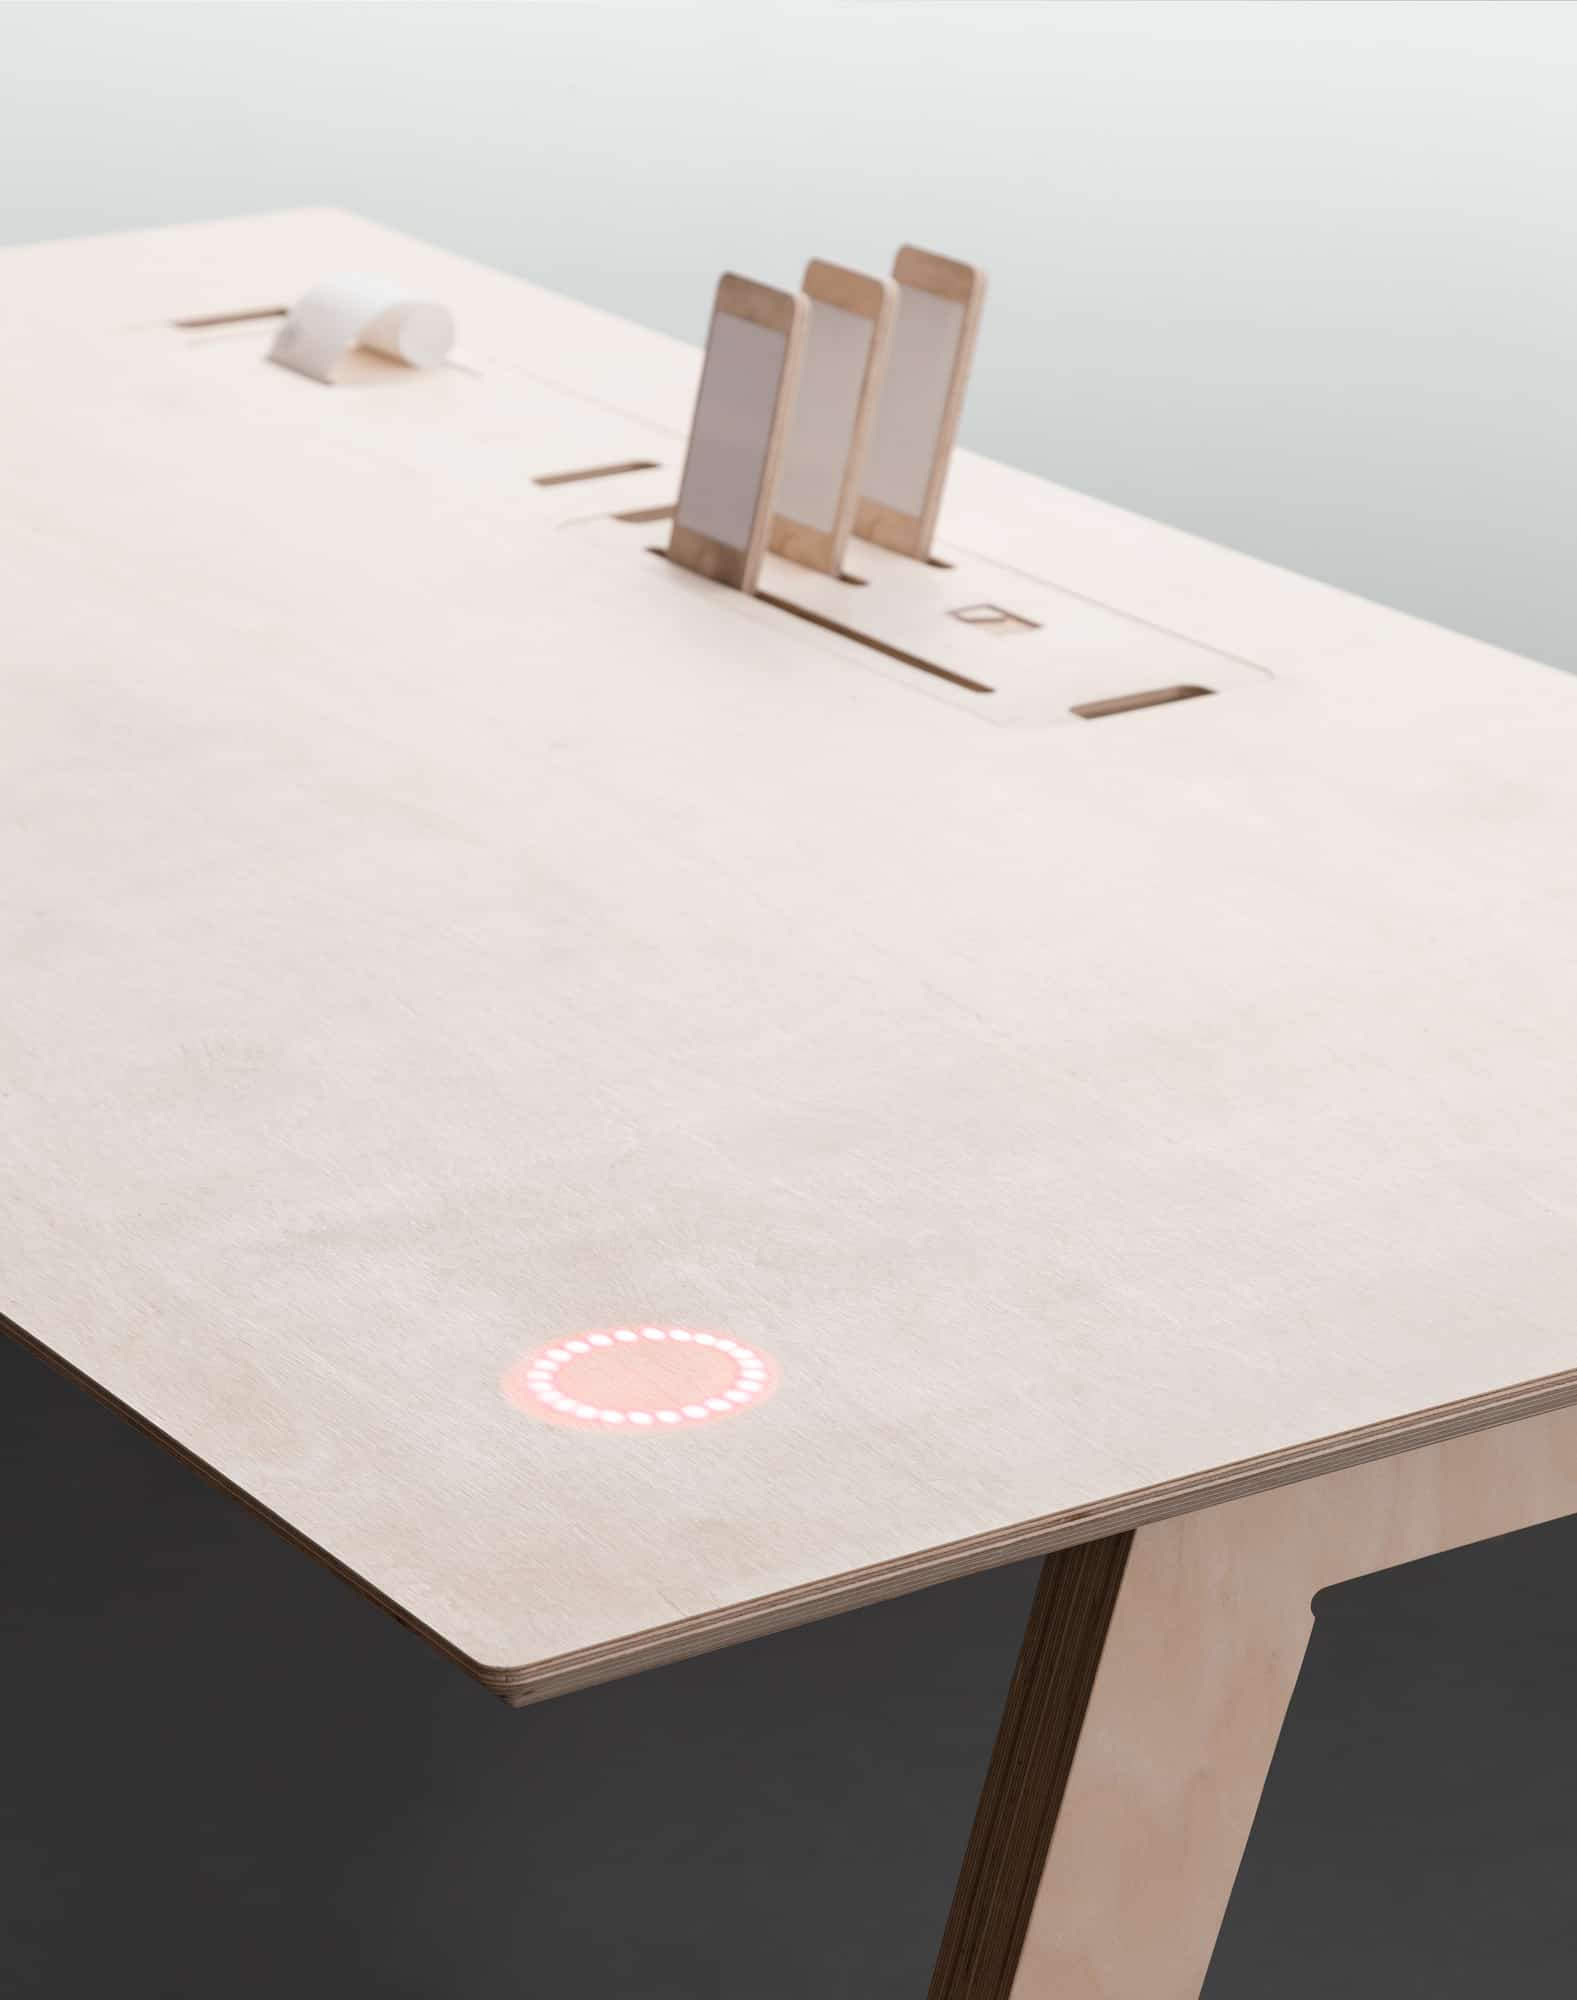 Opendesk_Product_Smart-desk_Prototype_RG689c_1051